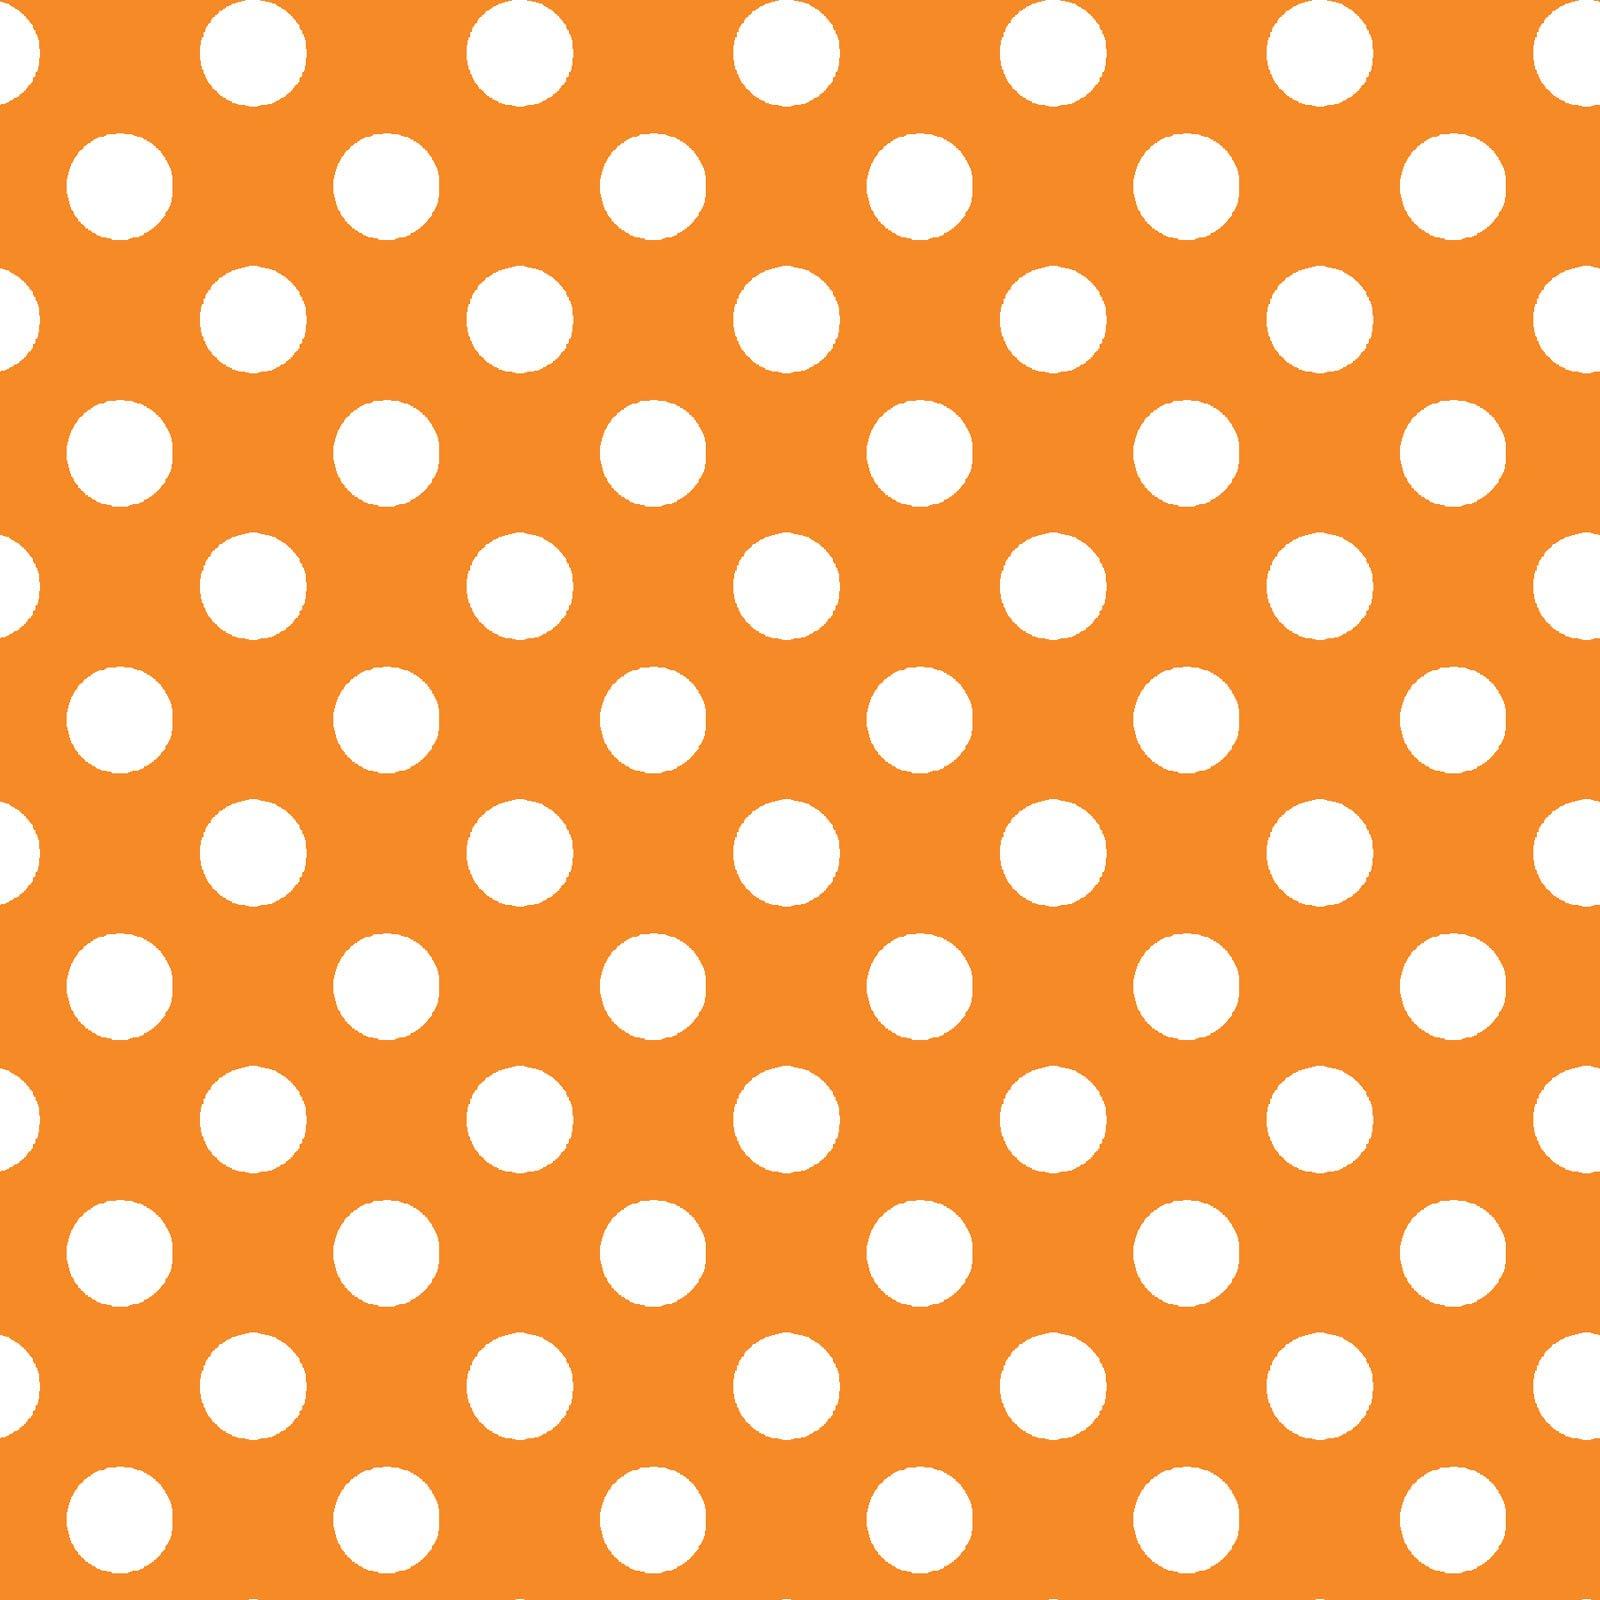 KimberBell Basics Orange Dots 8216M-O